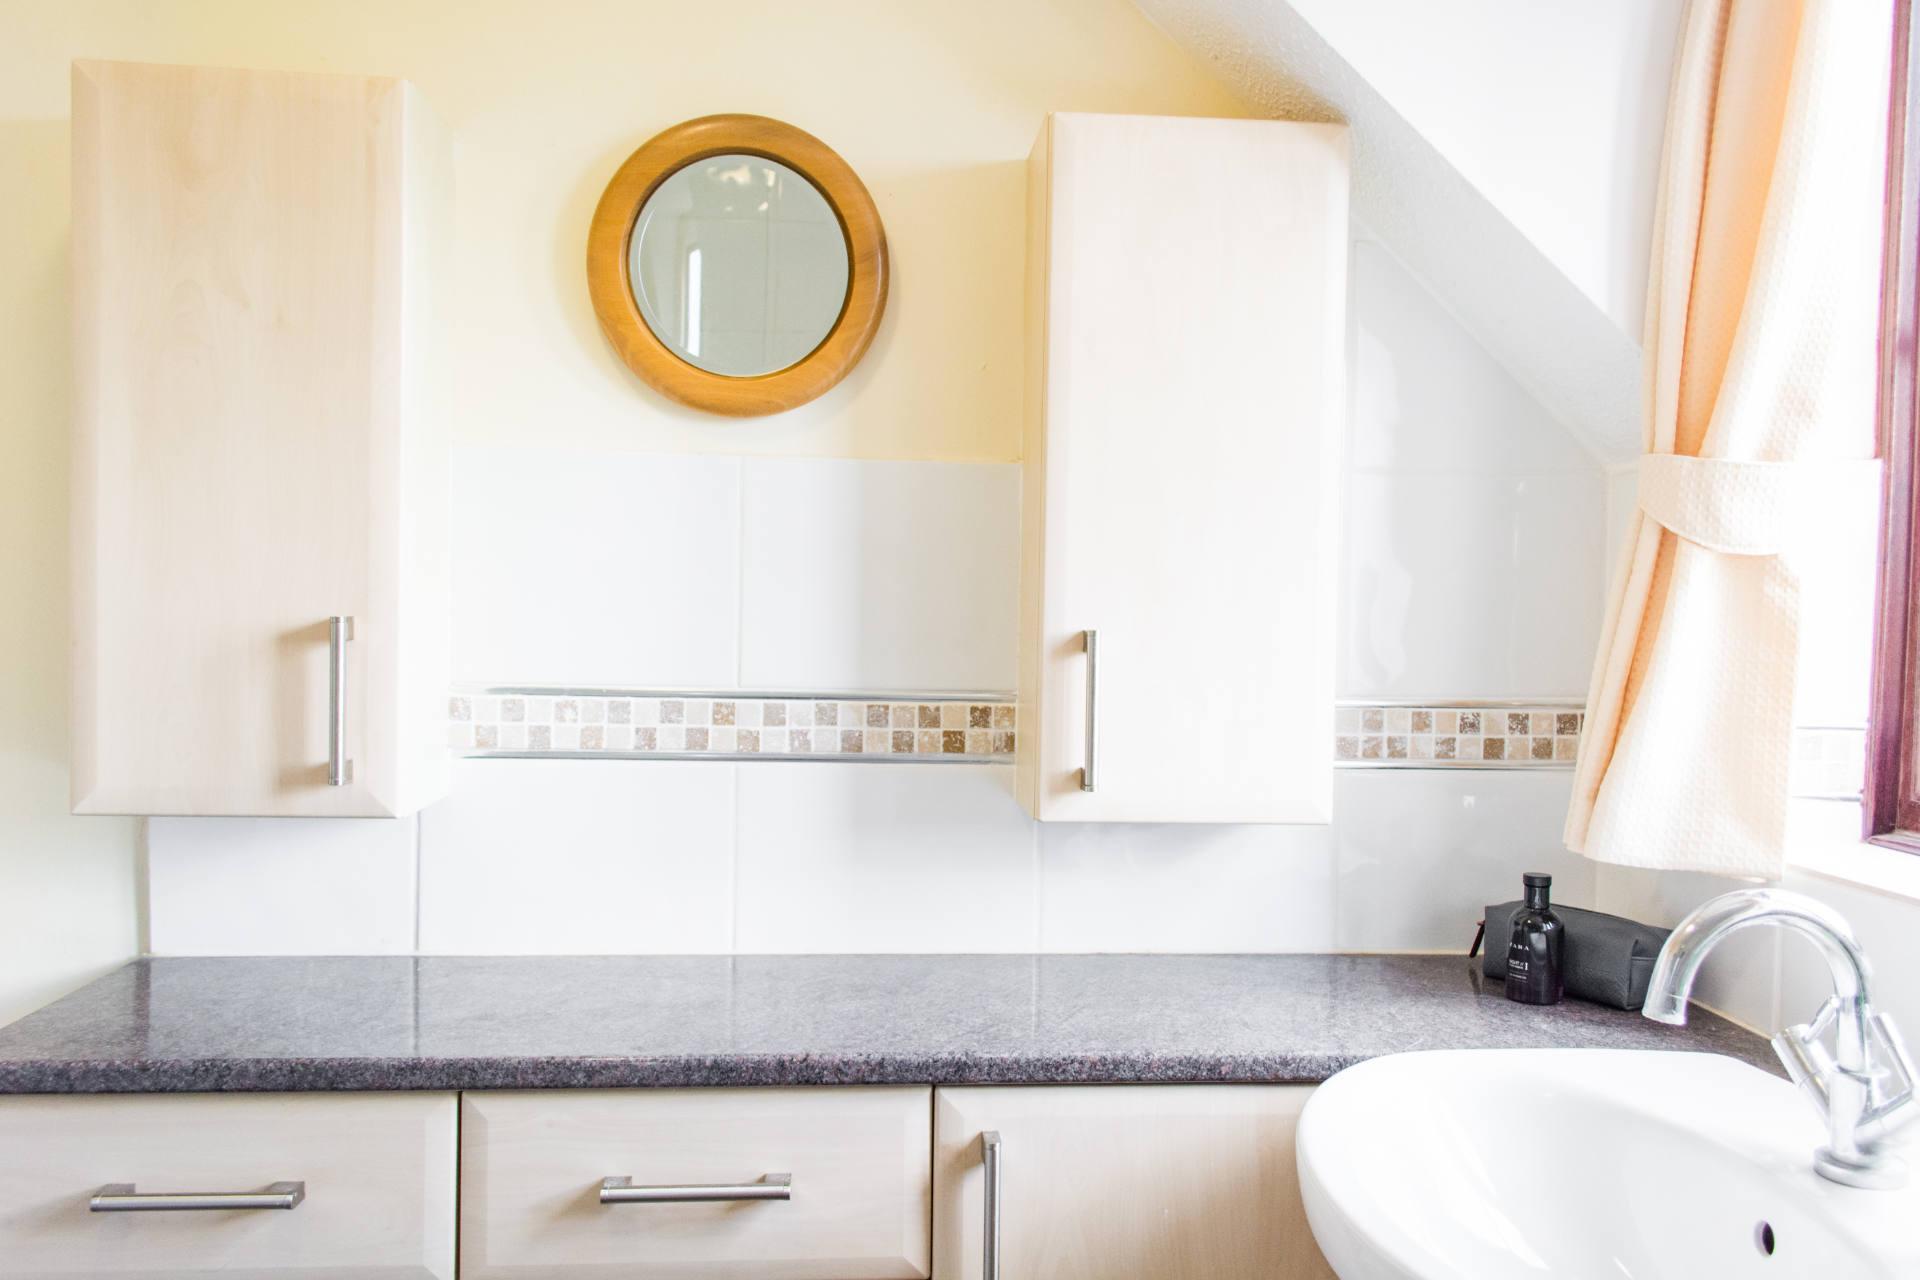 Bathroom mirror and cupboards.